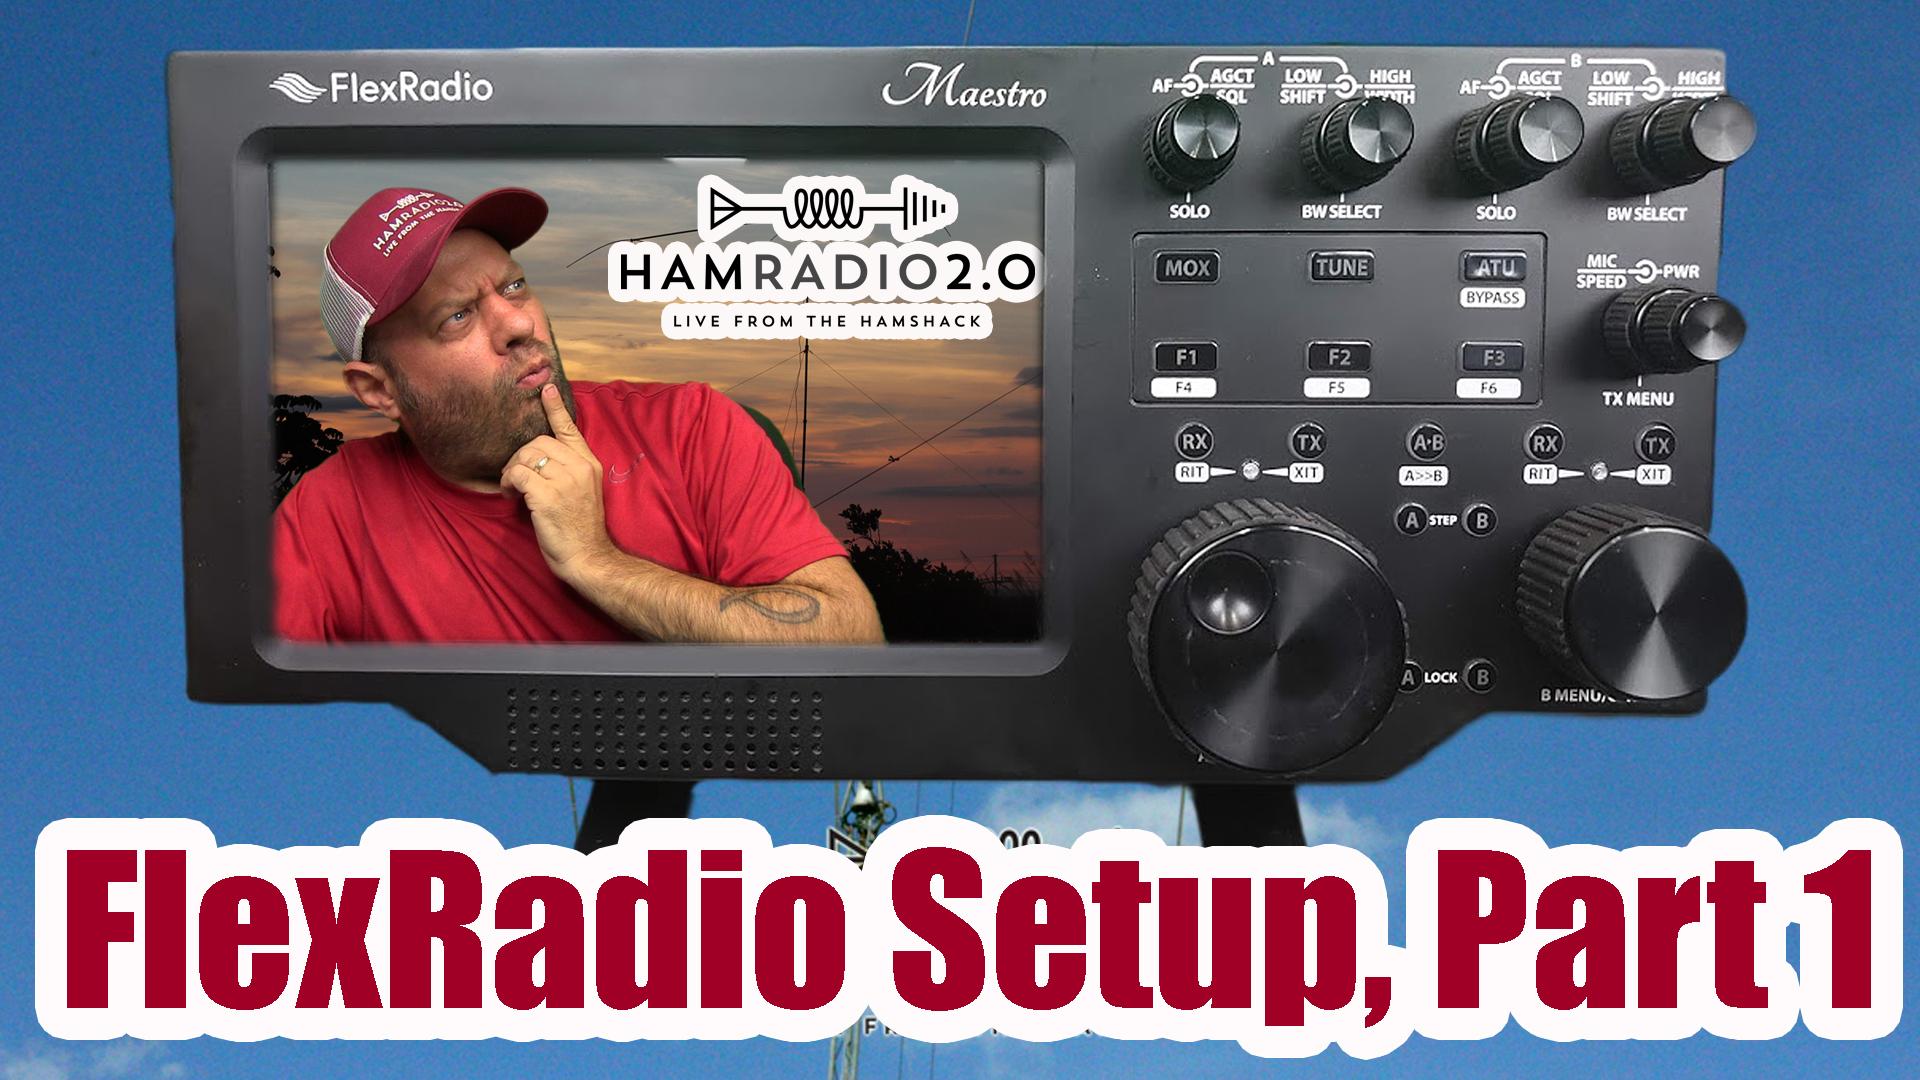 Episode 235: FlexRadio 6000 Series Initial Setup Part 1